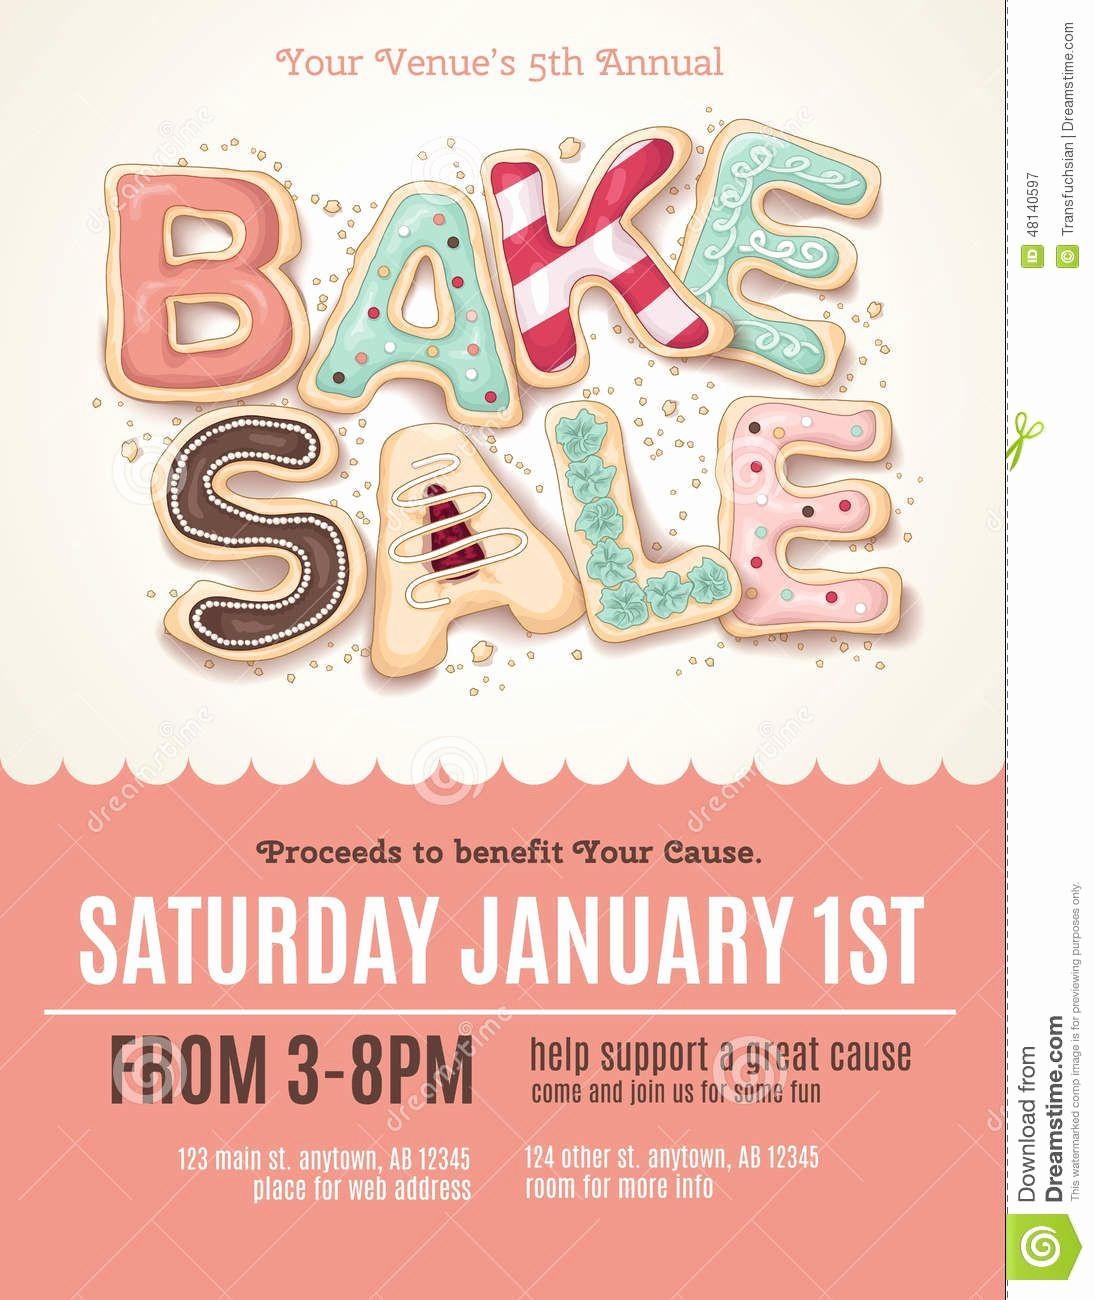 Bake Sale Flyer Template Free Luxury Fun Cookie Bake Sale Flyer Template Download From Over